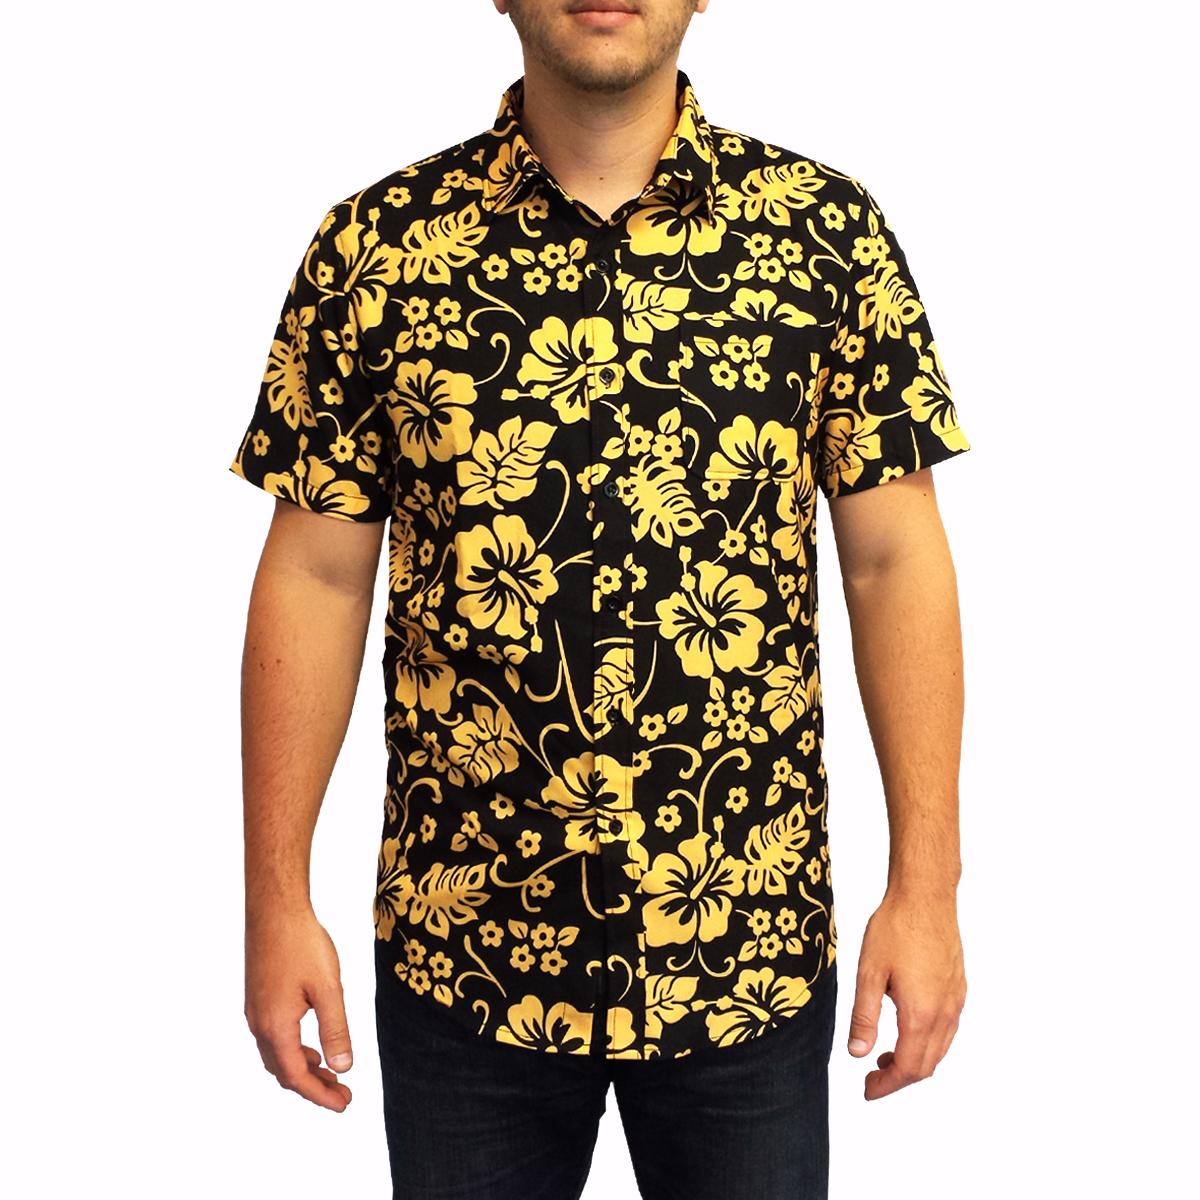 Raoul Duke Shirt Hunter S. Thompson Costume Fear and Loat...